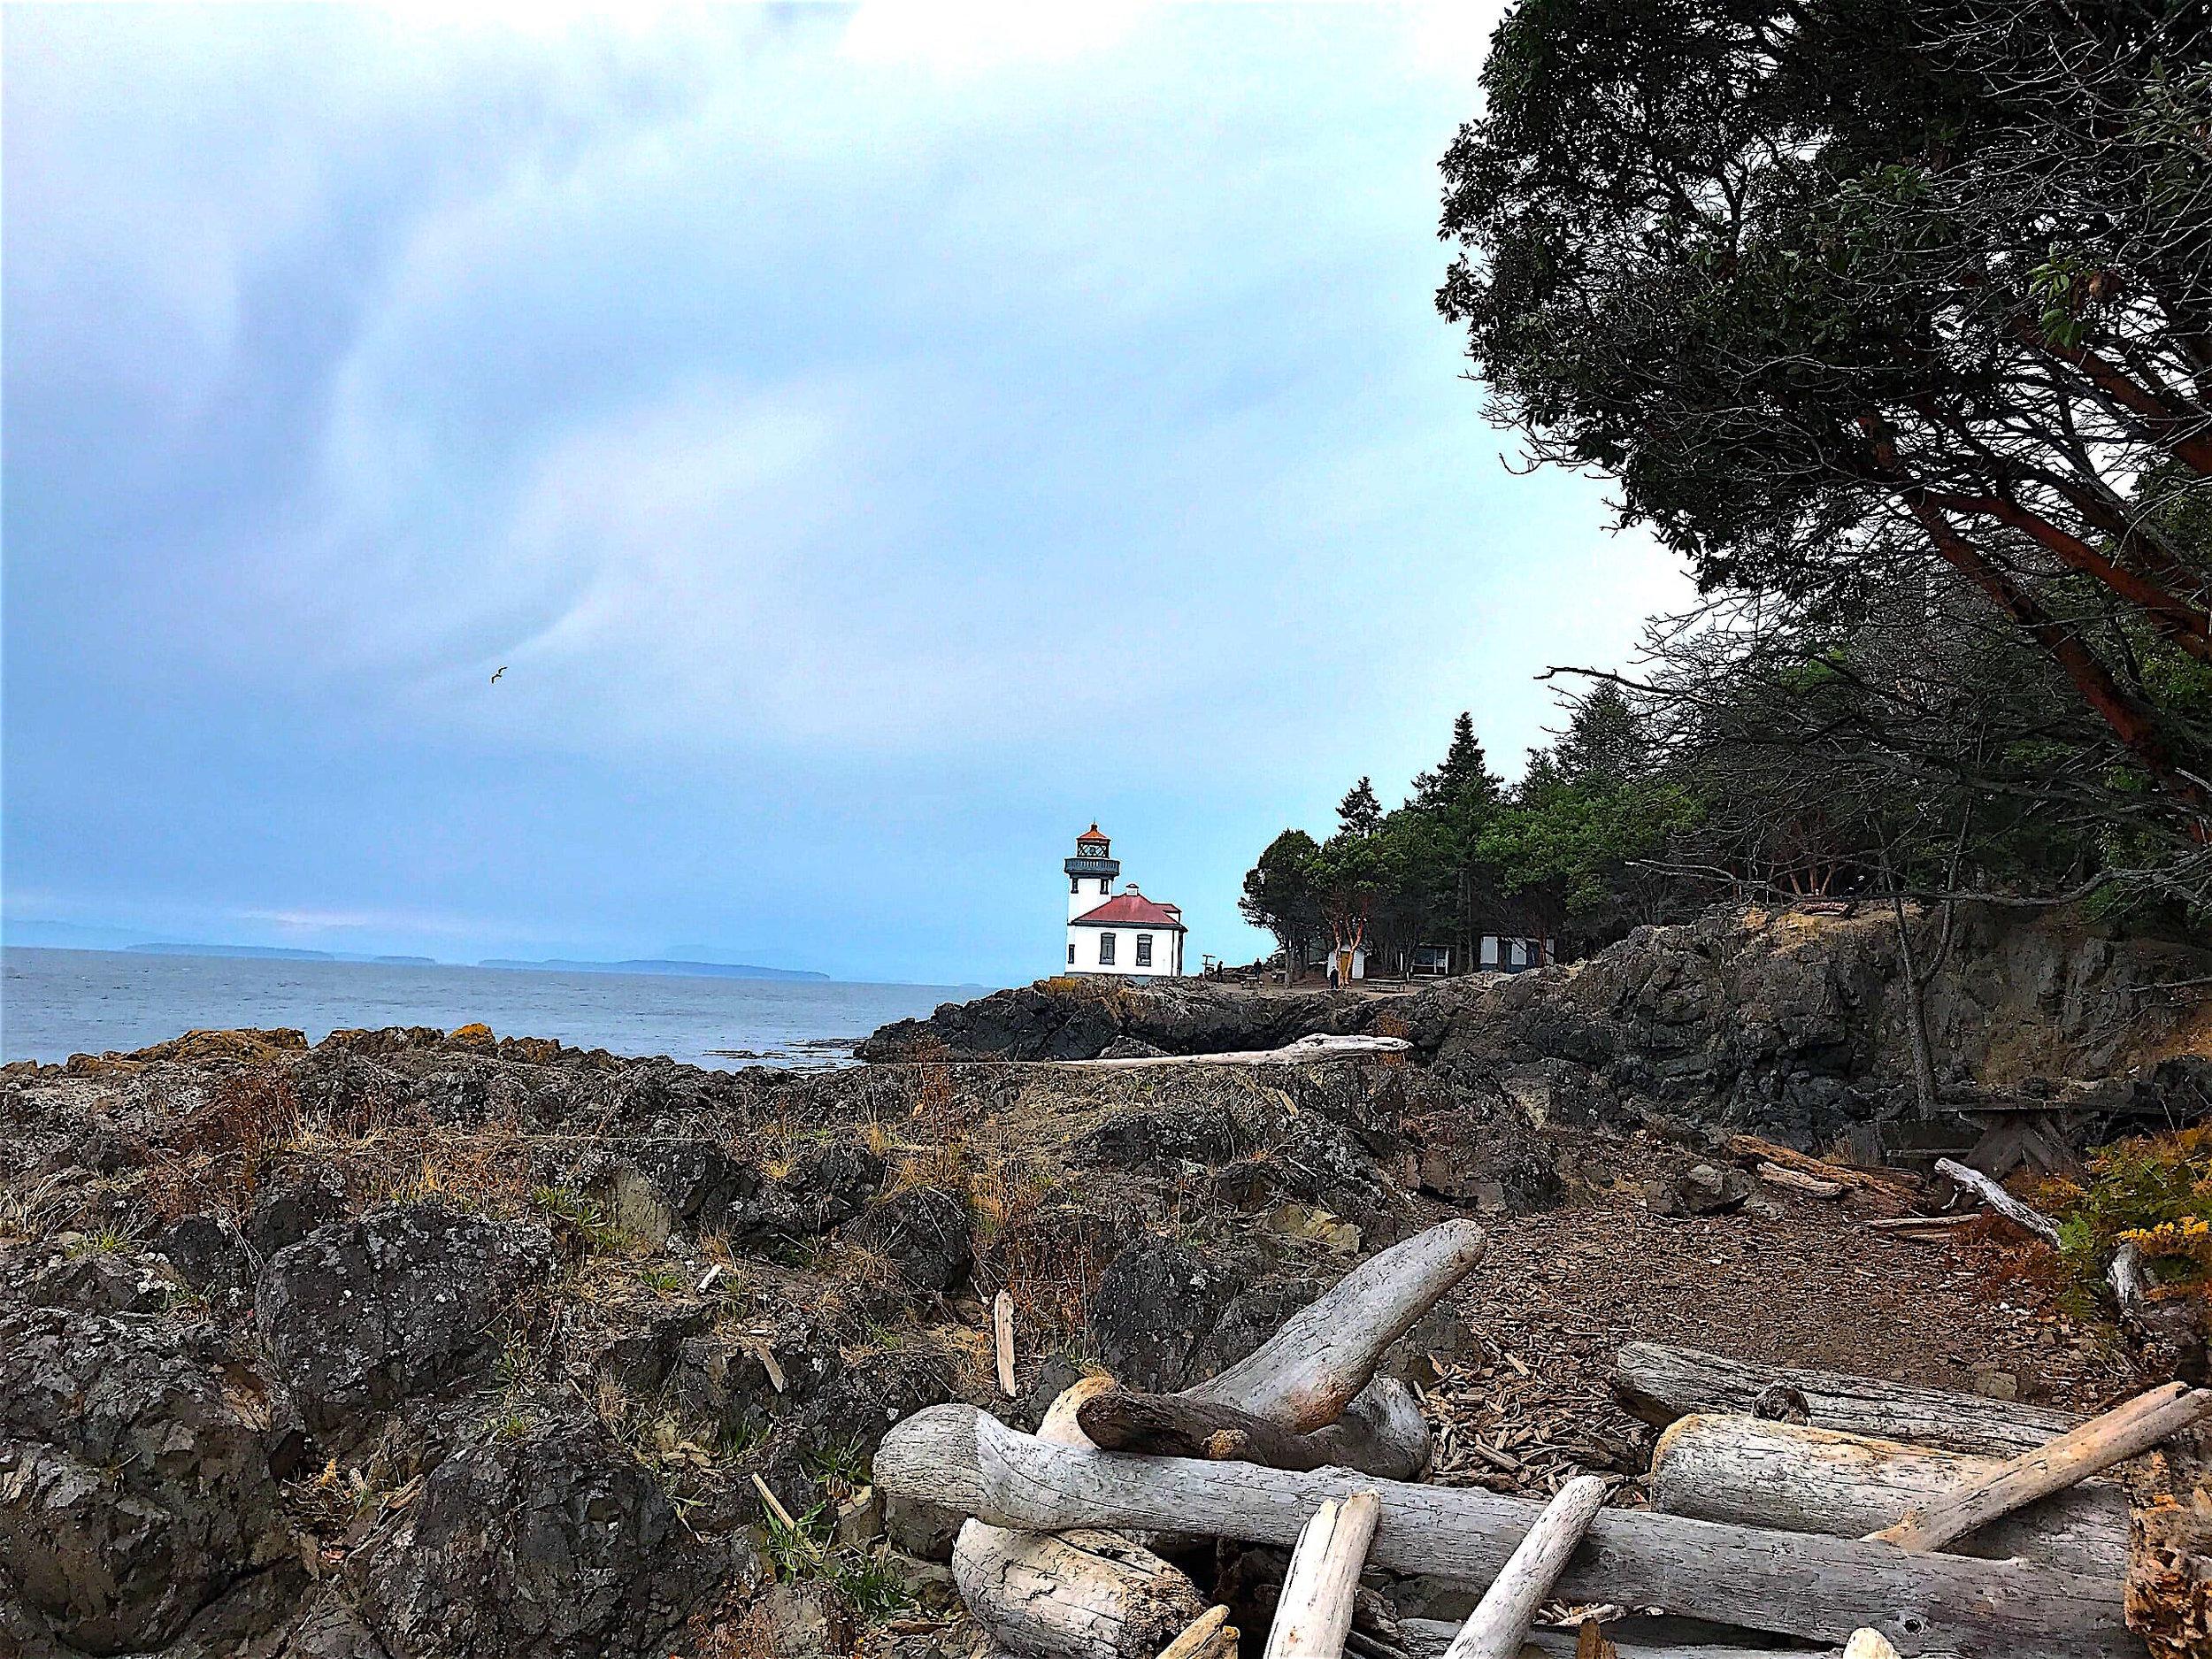 Hike a quarter mile to the Lime Kiln Lighthouse